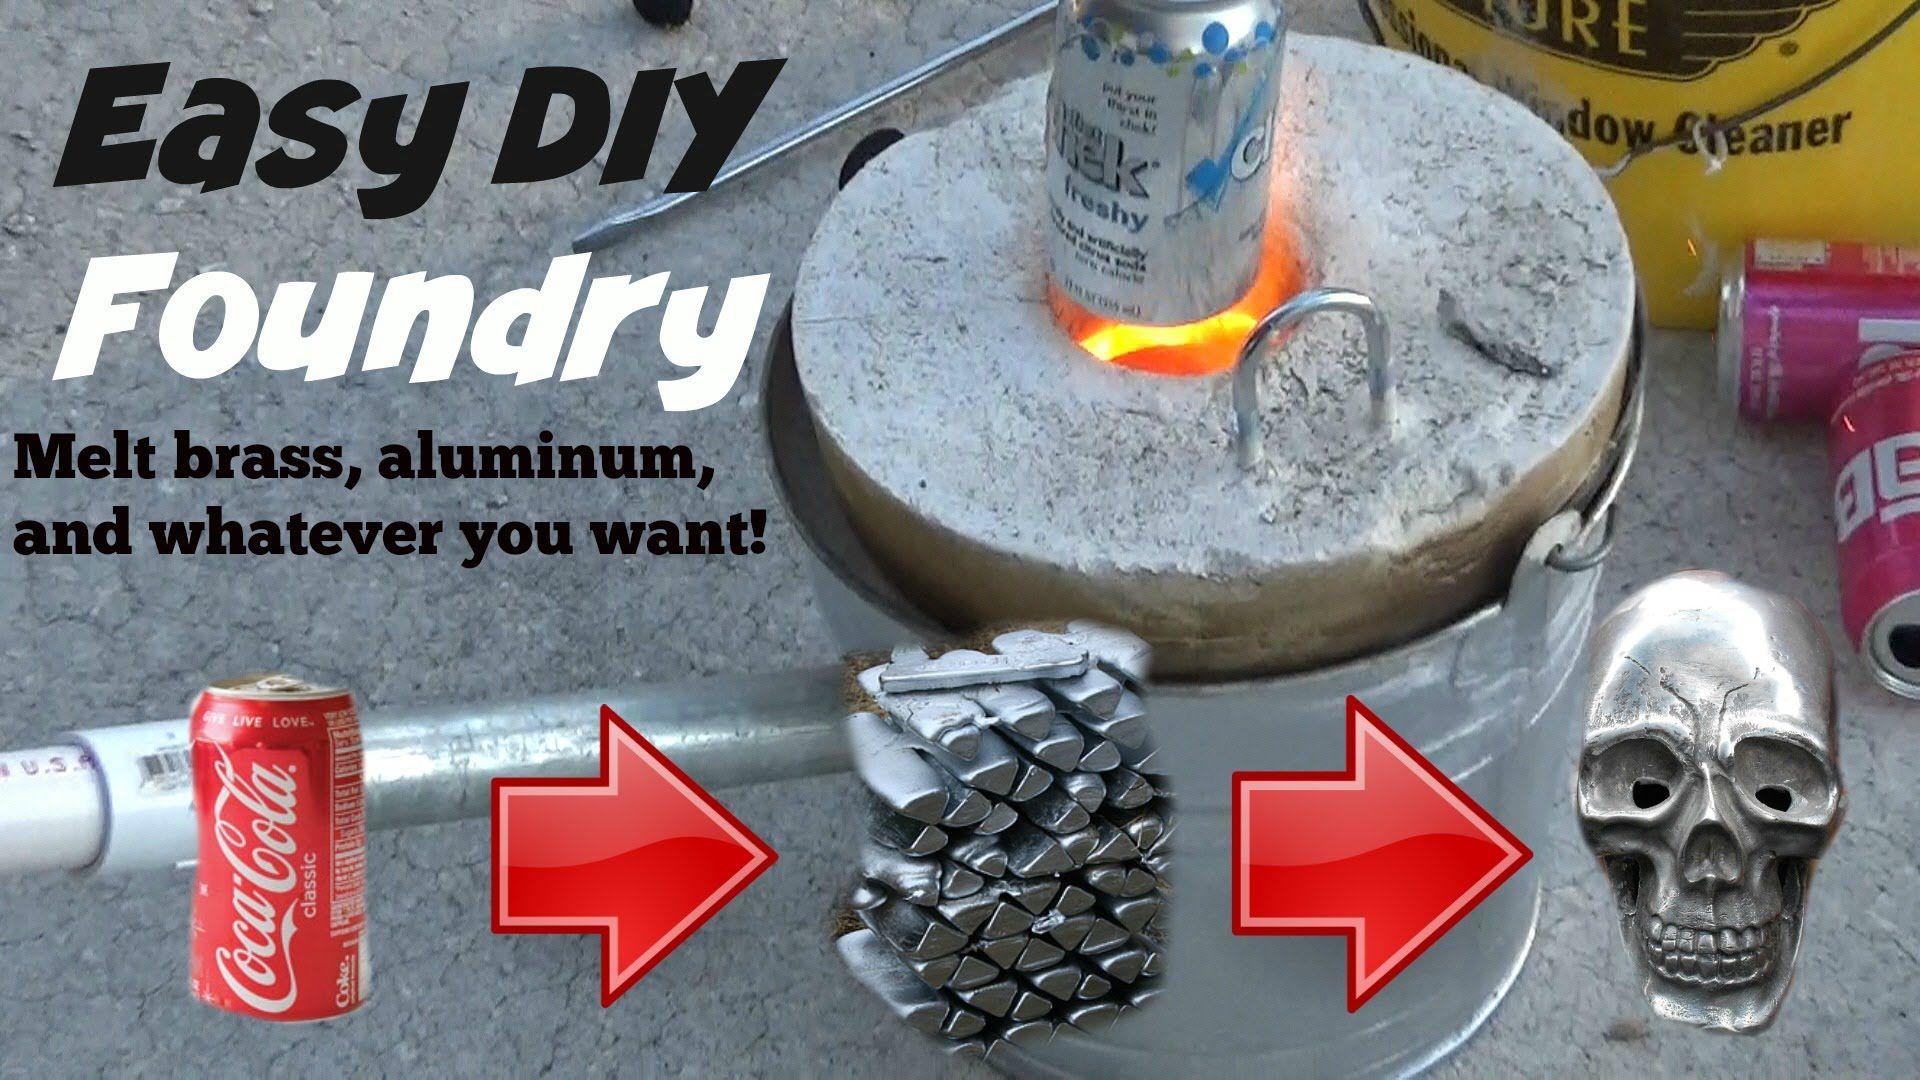 How To Make A Metal Melting Foundry. MELT ALUMINUM, BRASS